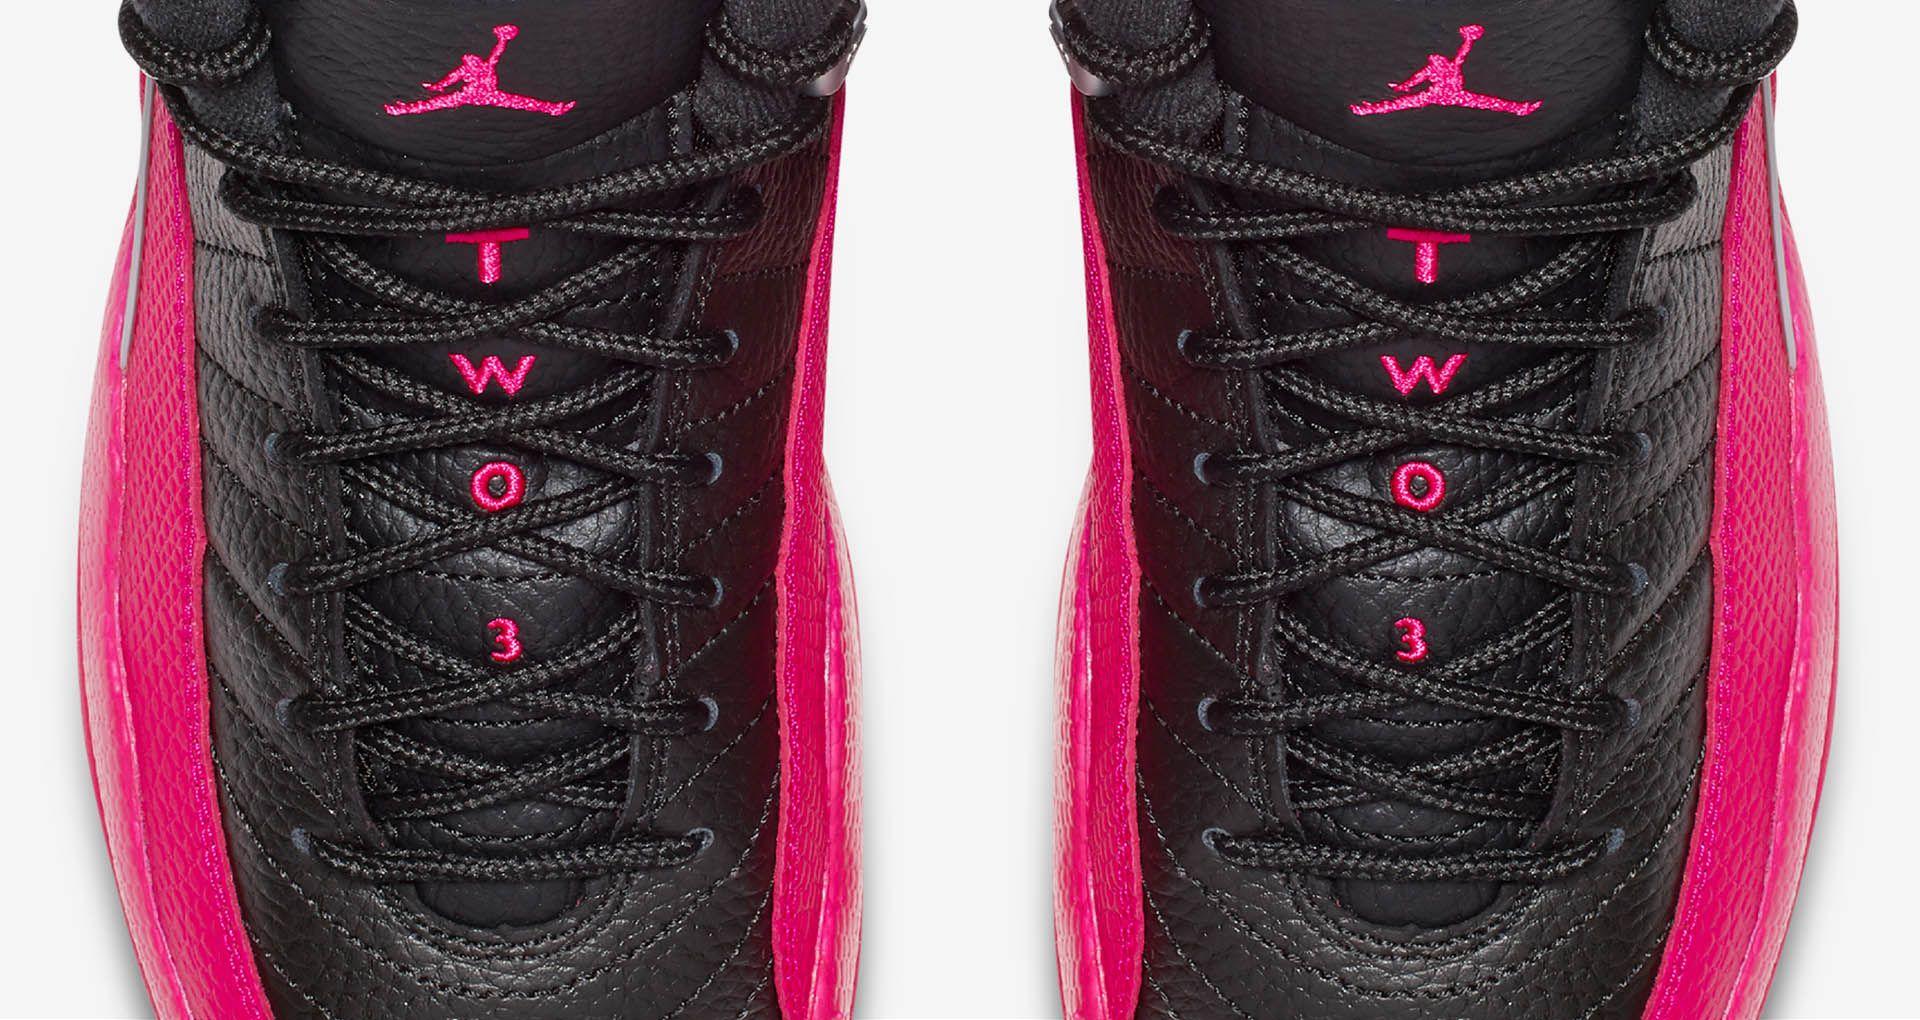 6894f326 Girls' Air Jordan 12 Retro 'Black & Deadly Pink' Release Date. Nike ...